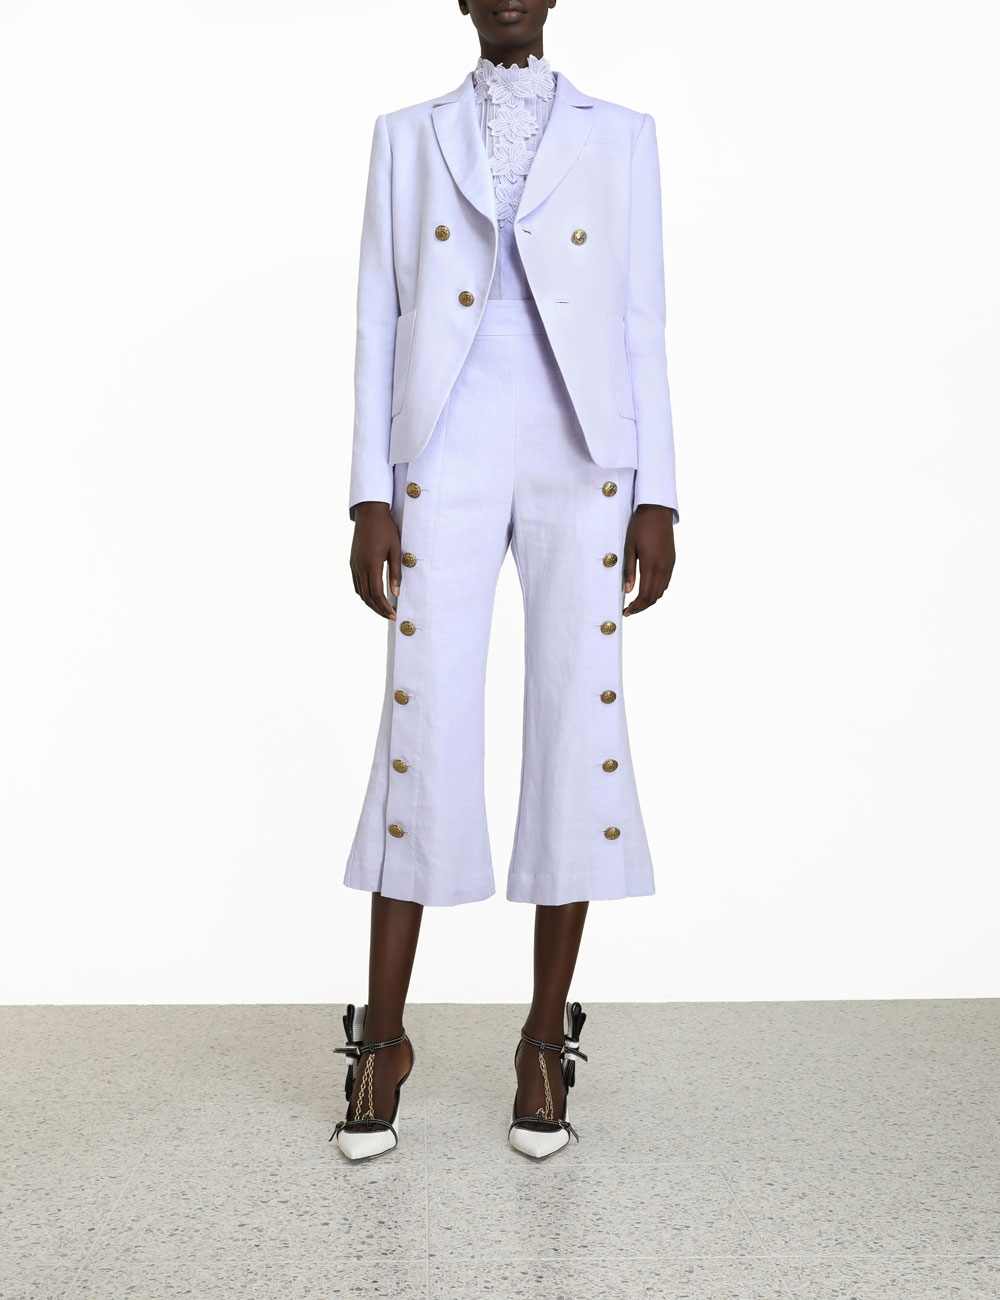 The Lovestruck Tuxedo Jacket